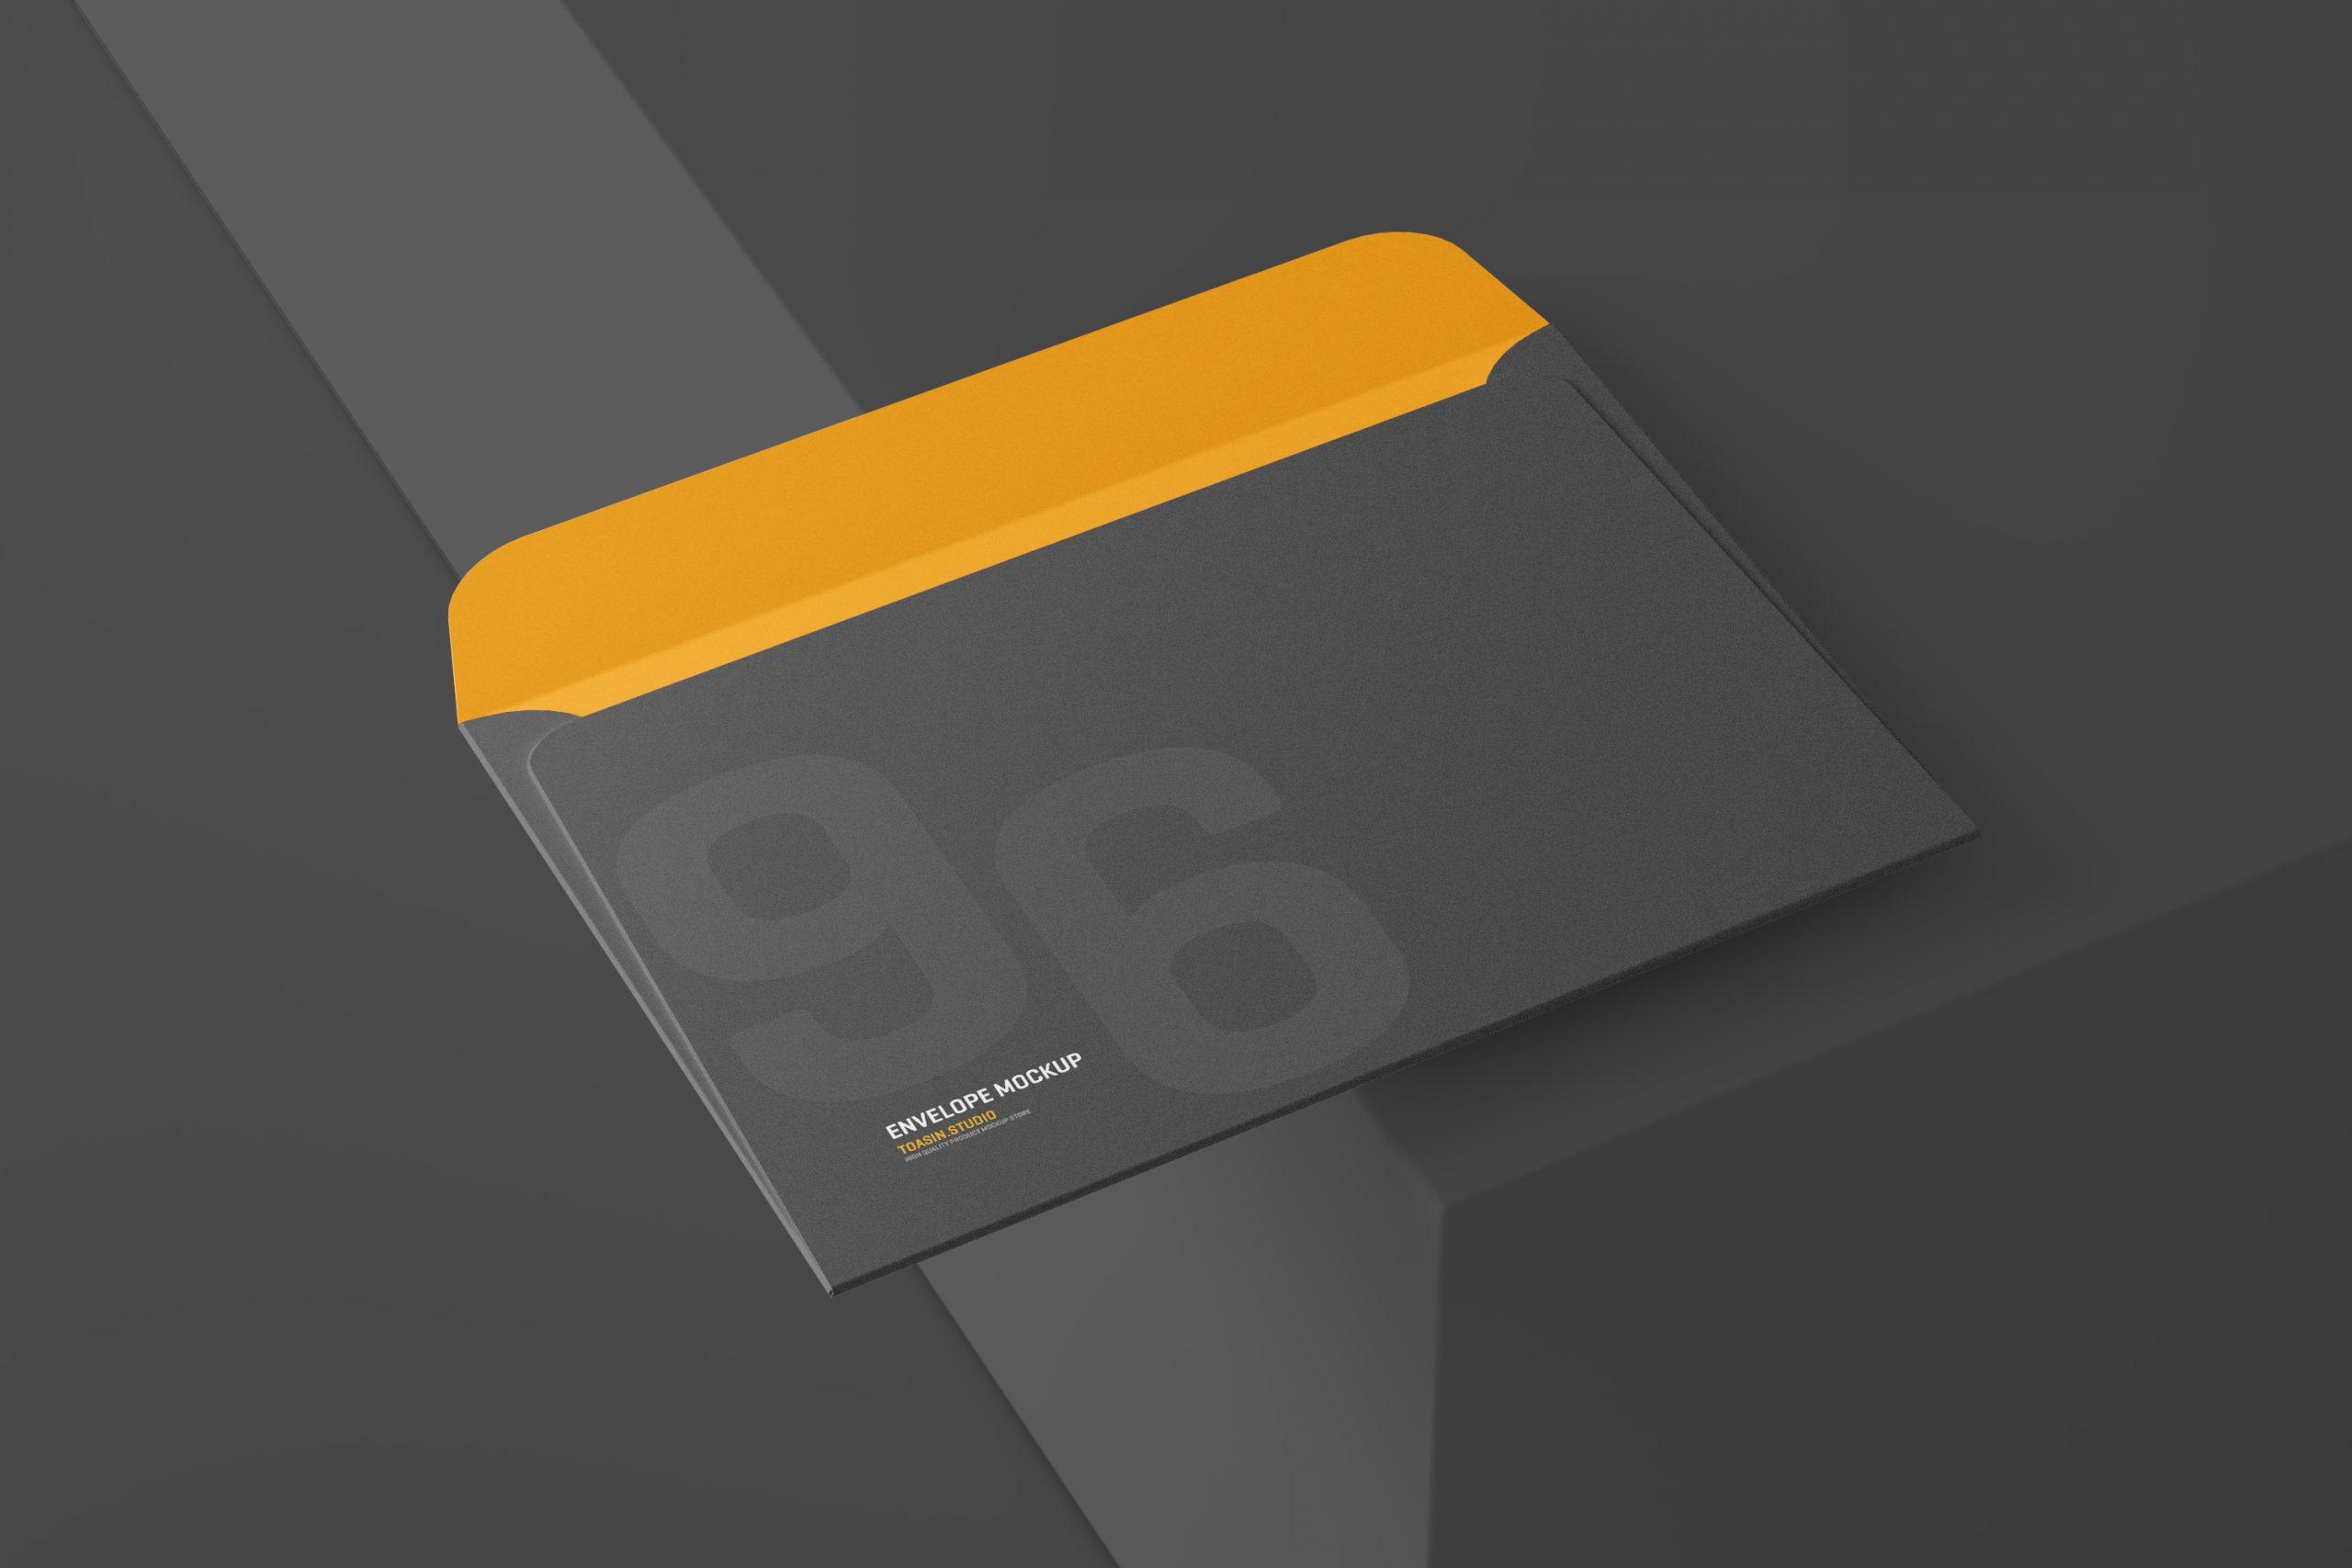 Free Envelope Mockup – 6×9 Inch